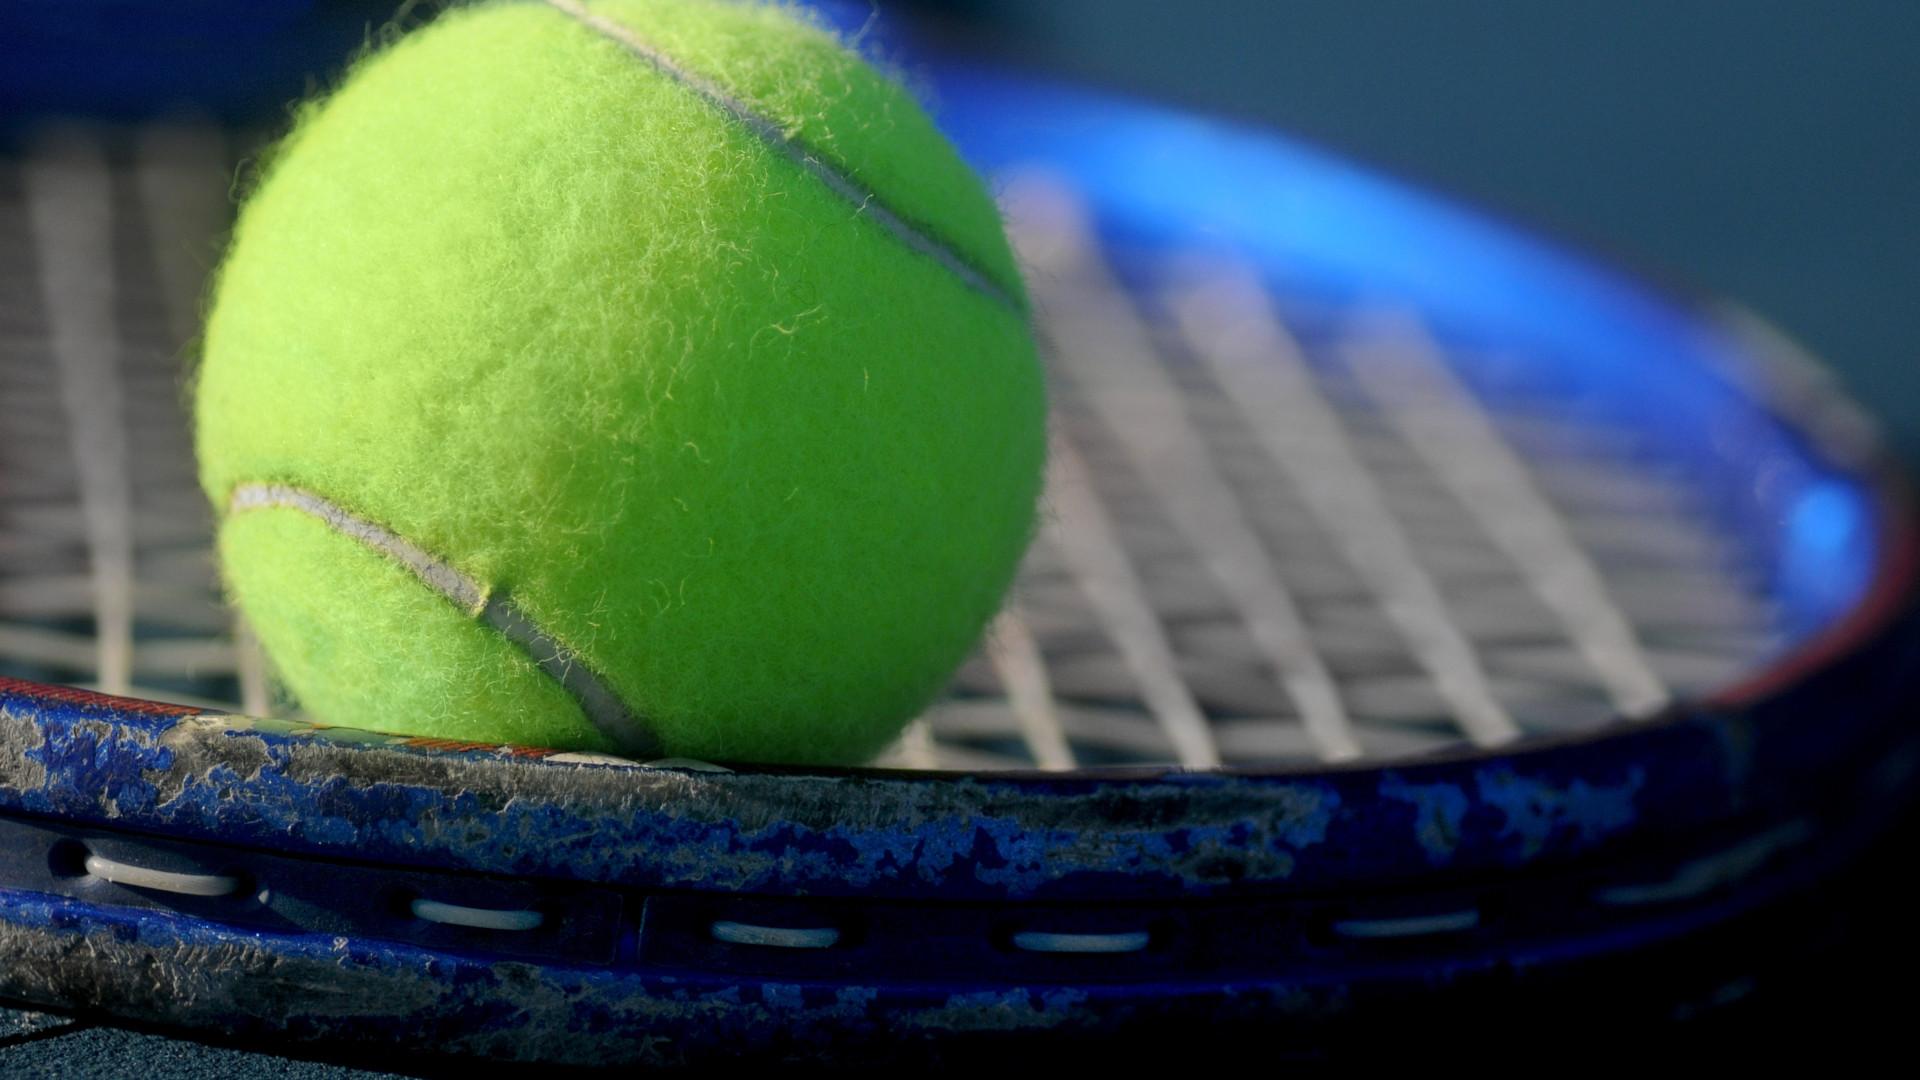 Tennis & Padel Courses